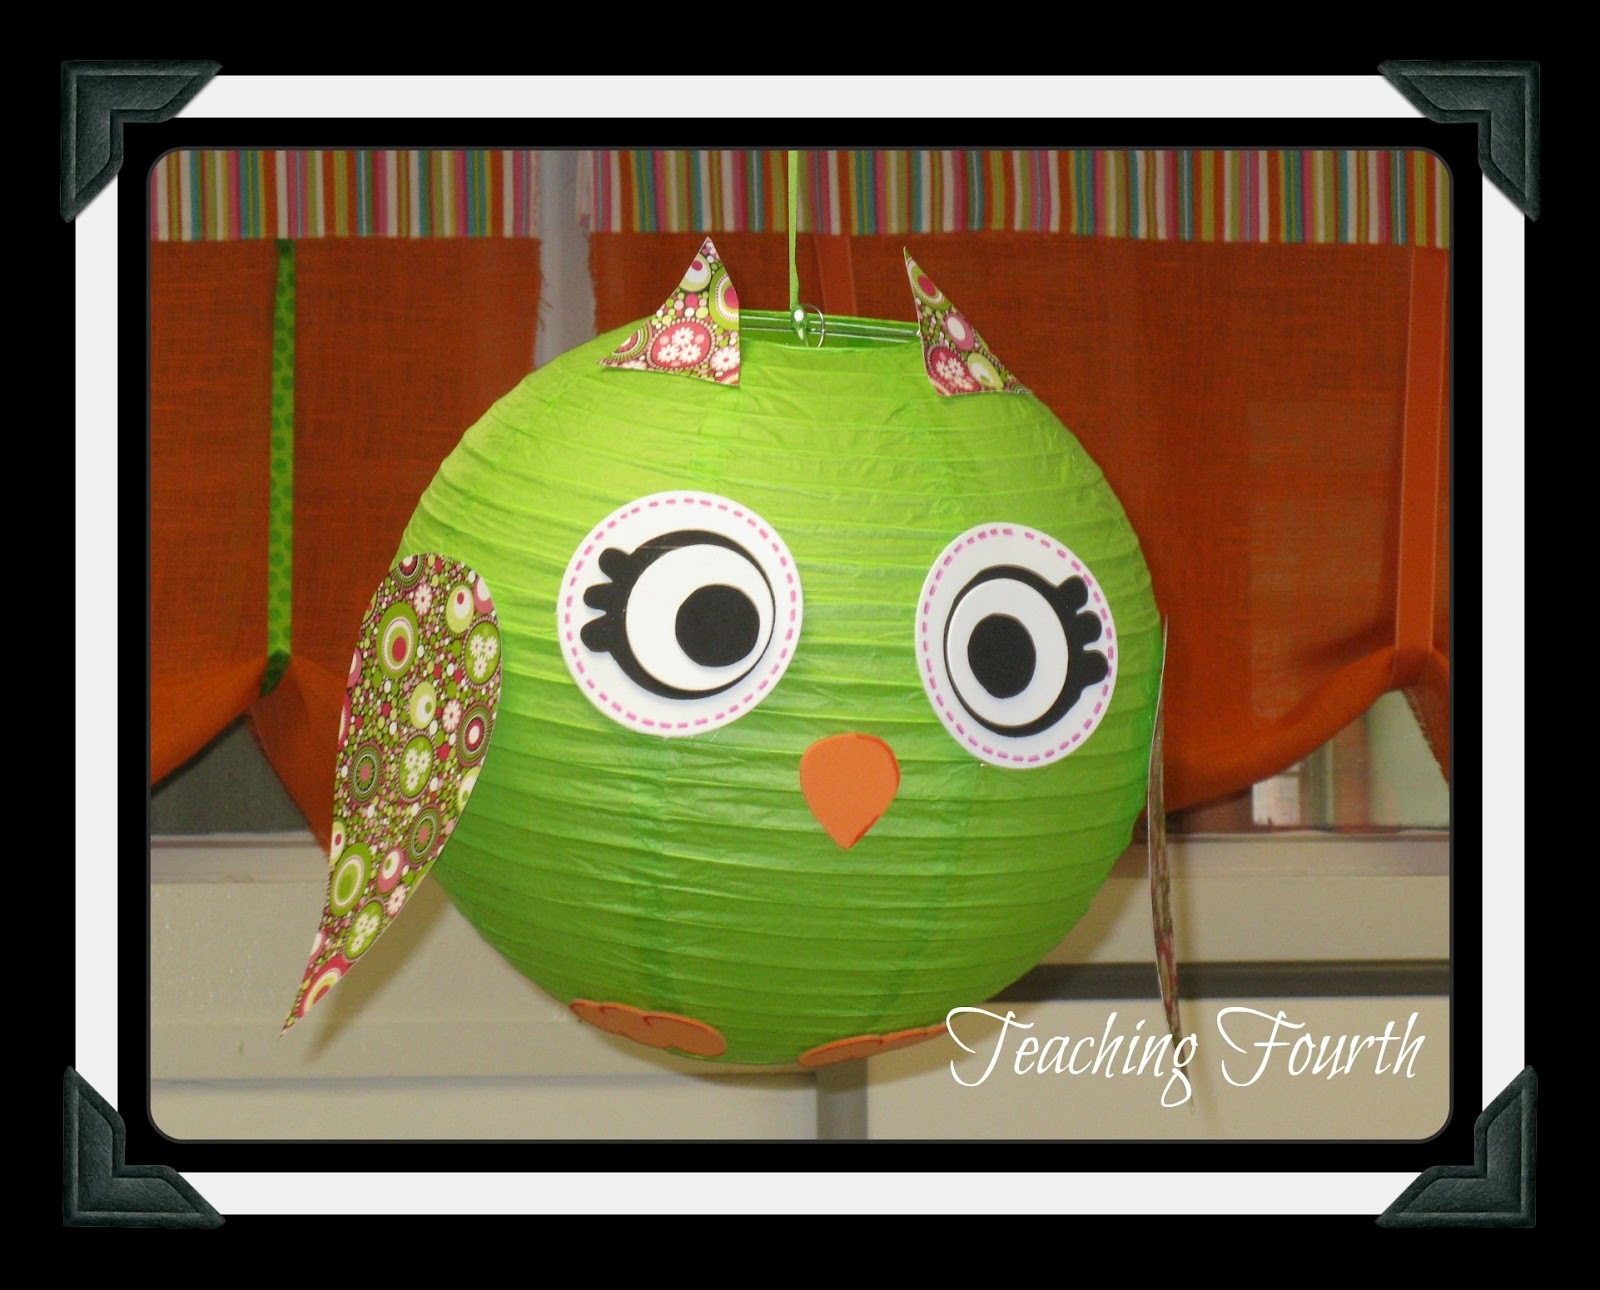 Classroom Owl Ideas ~ Teaching fourth sorry i fibbed more classroom